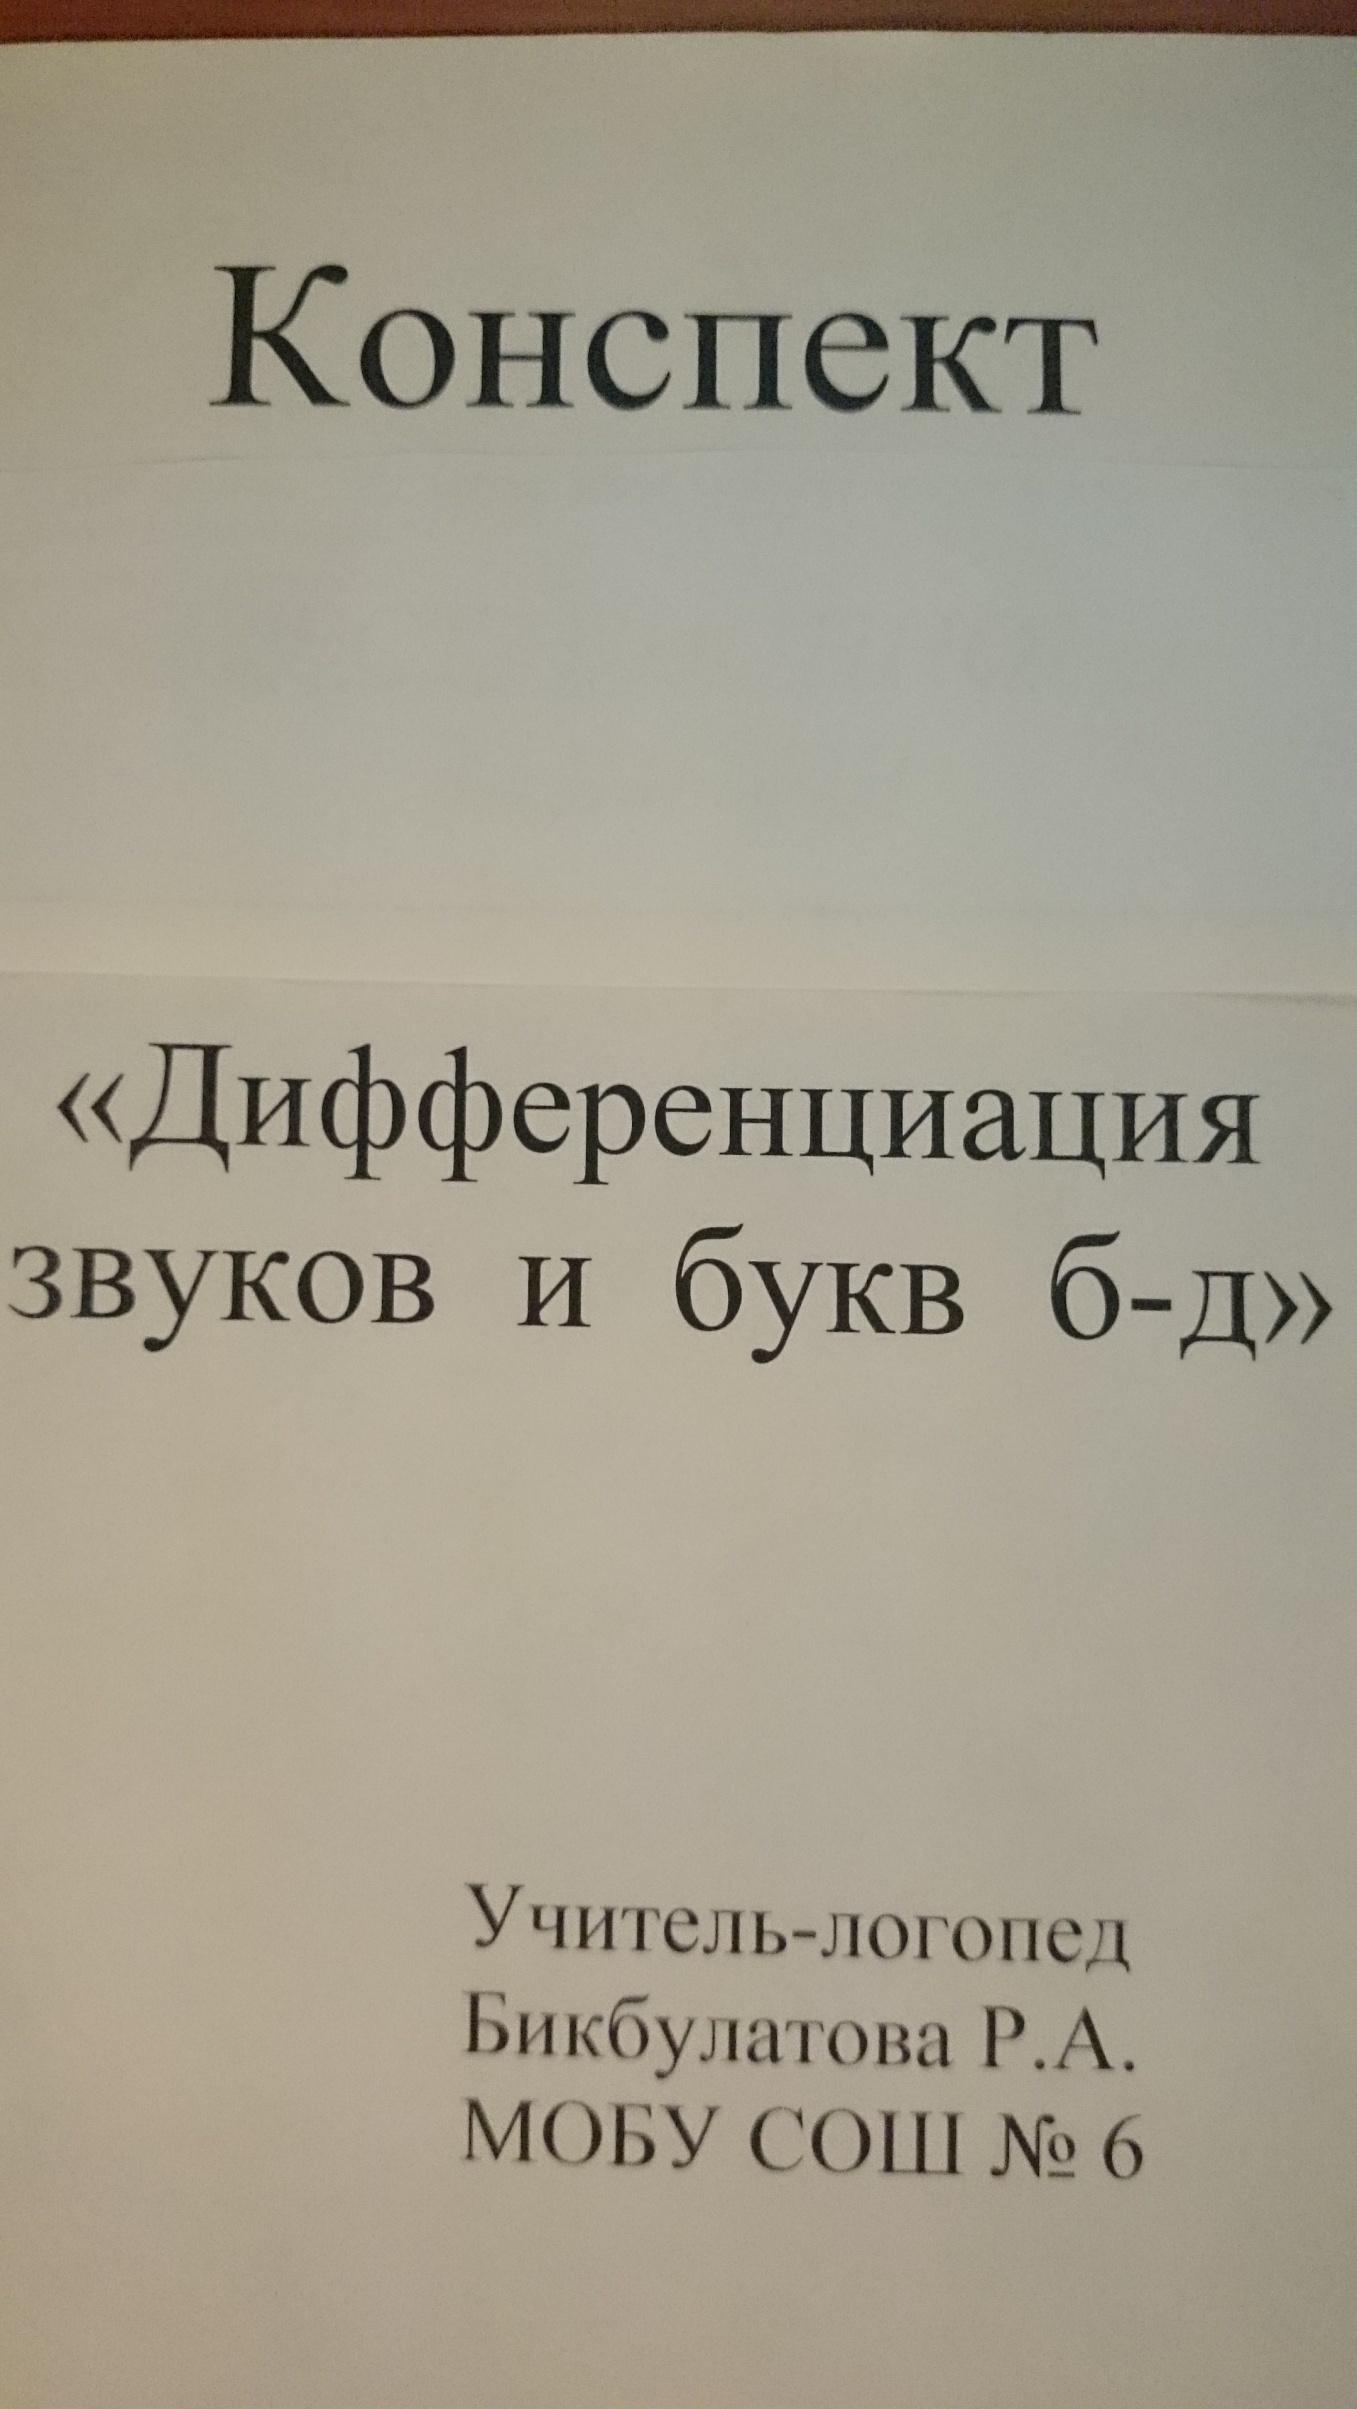 E:\Конспекты\DSC_0529.JPG